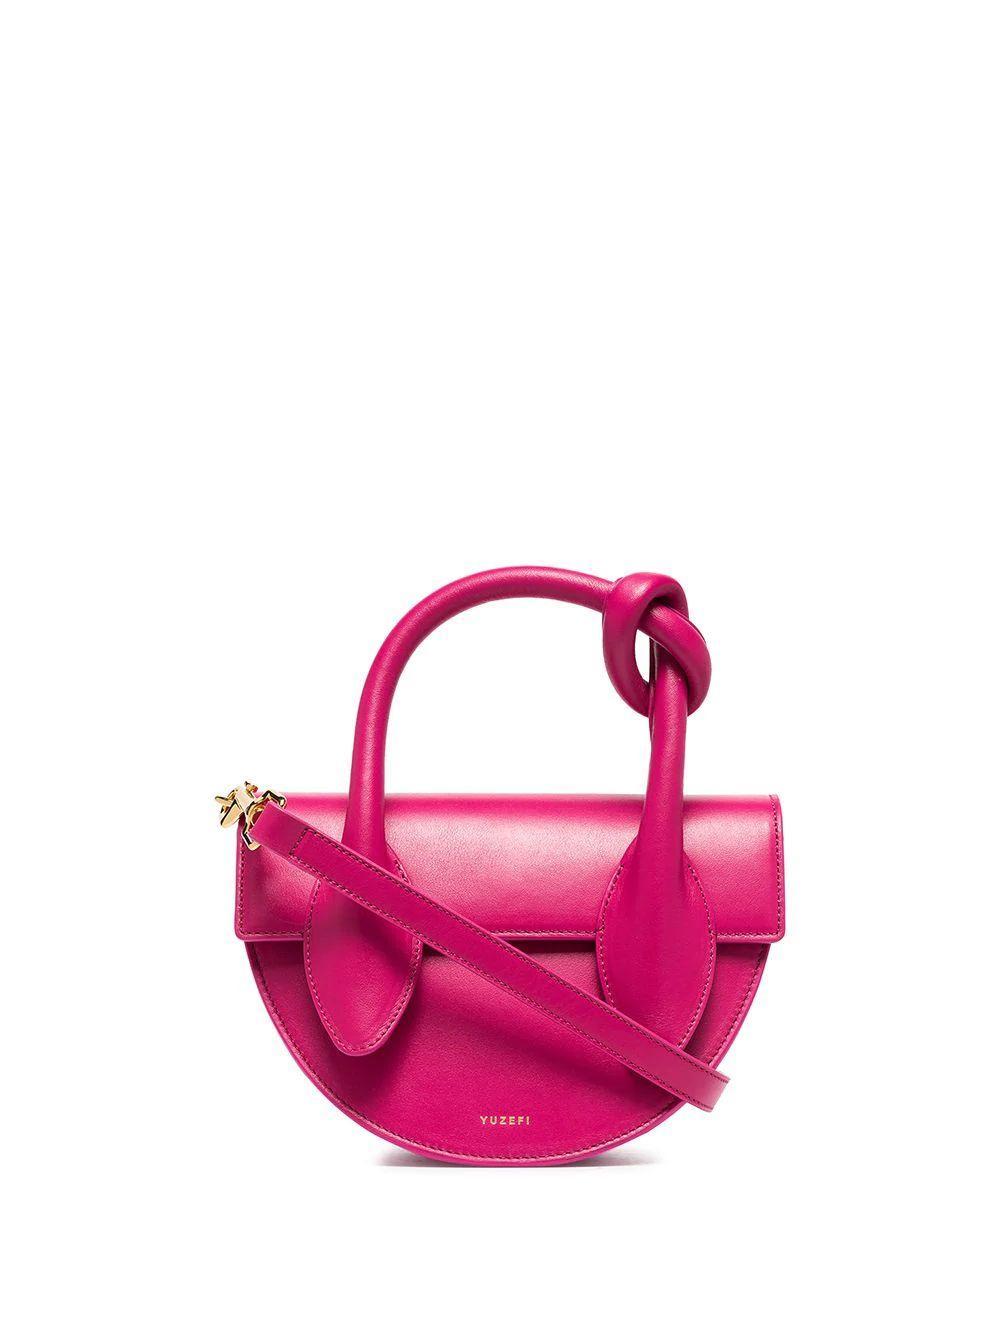 Dolores Crescent Bag Item # YUZSS20-DL-06